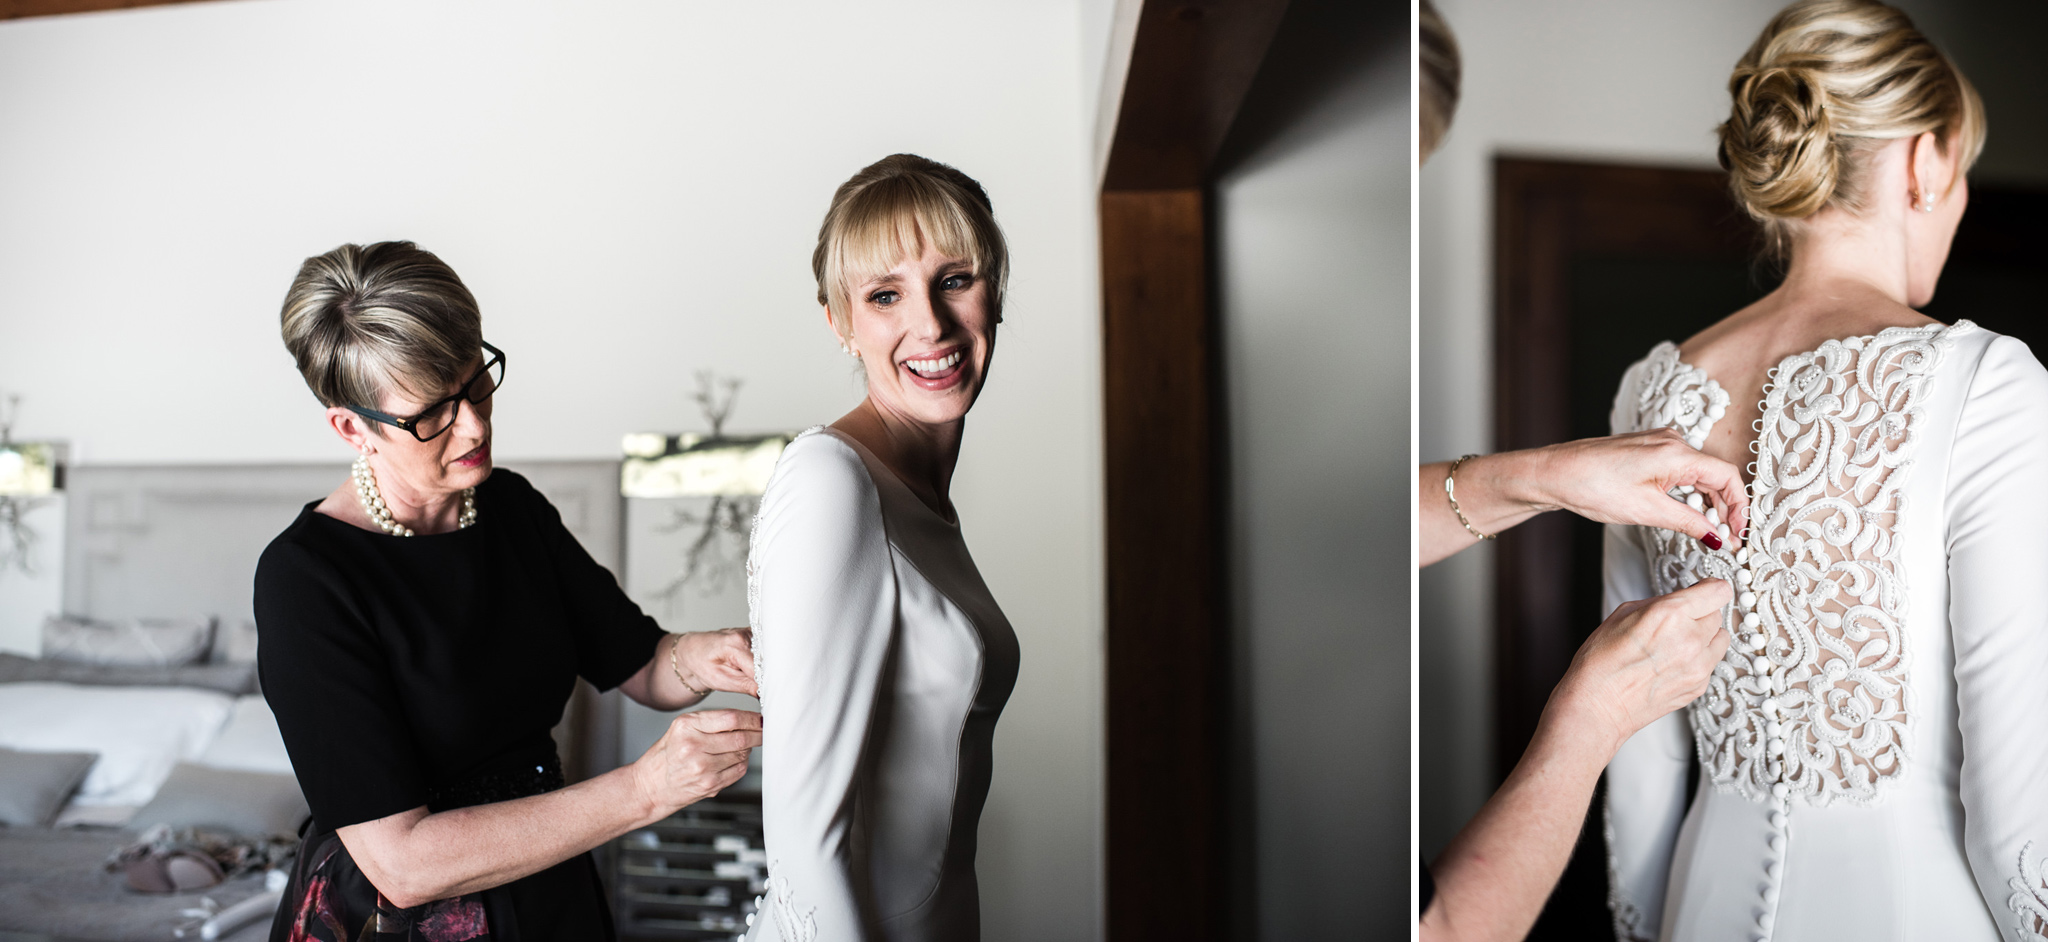 065-mother-helping-bride-put-dress-wedding-photographer-toronto.jpg